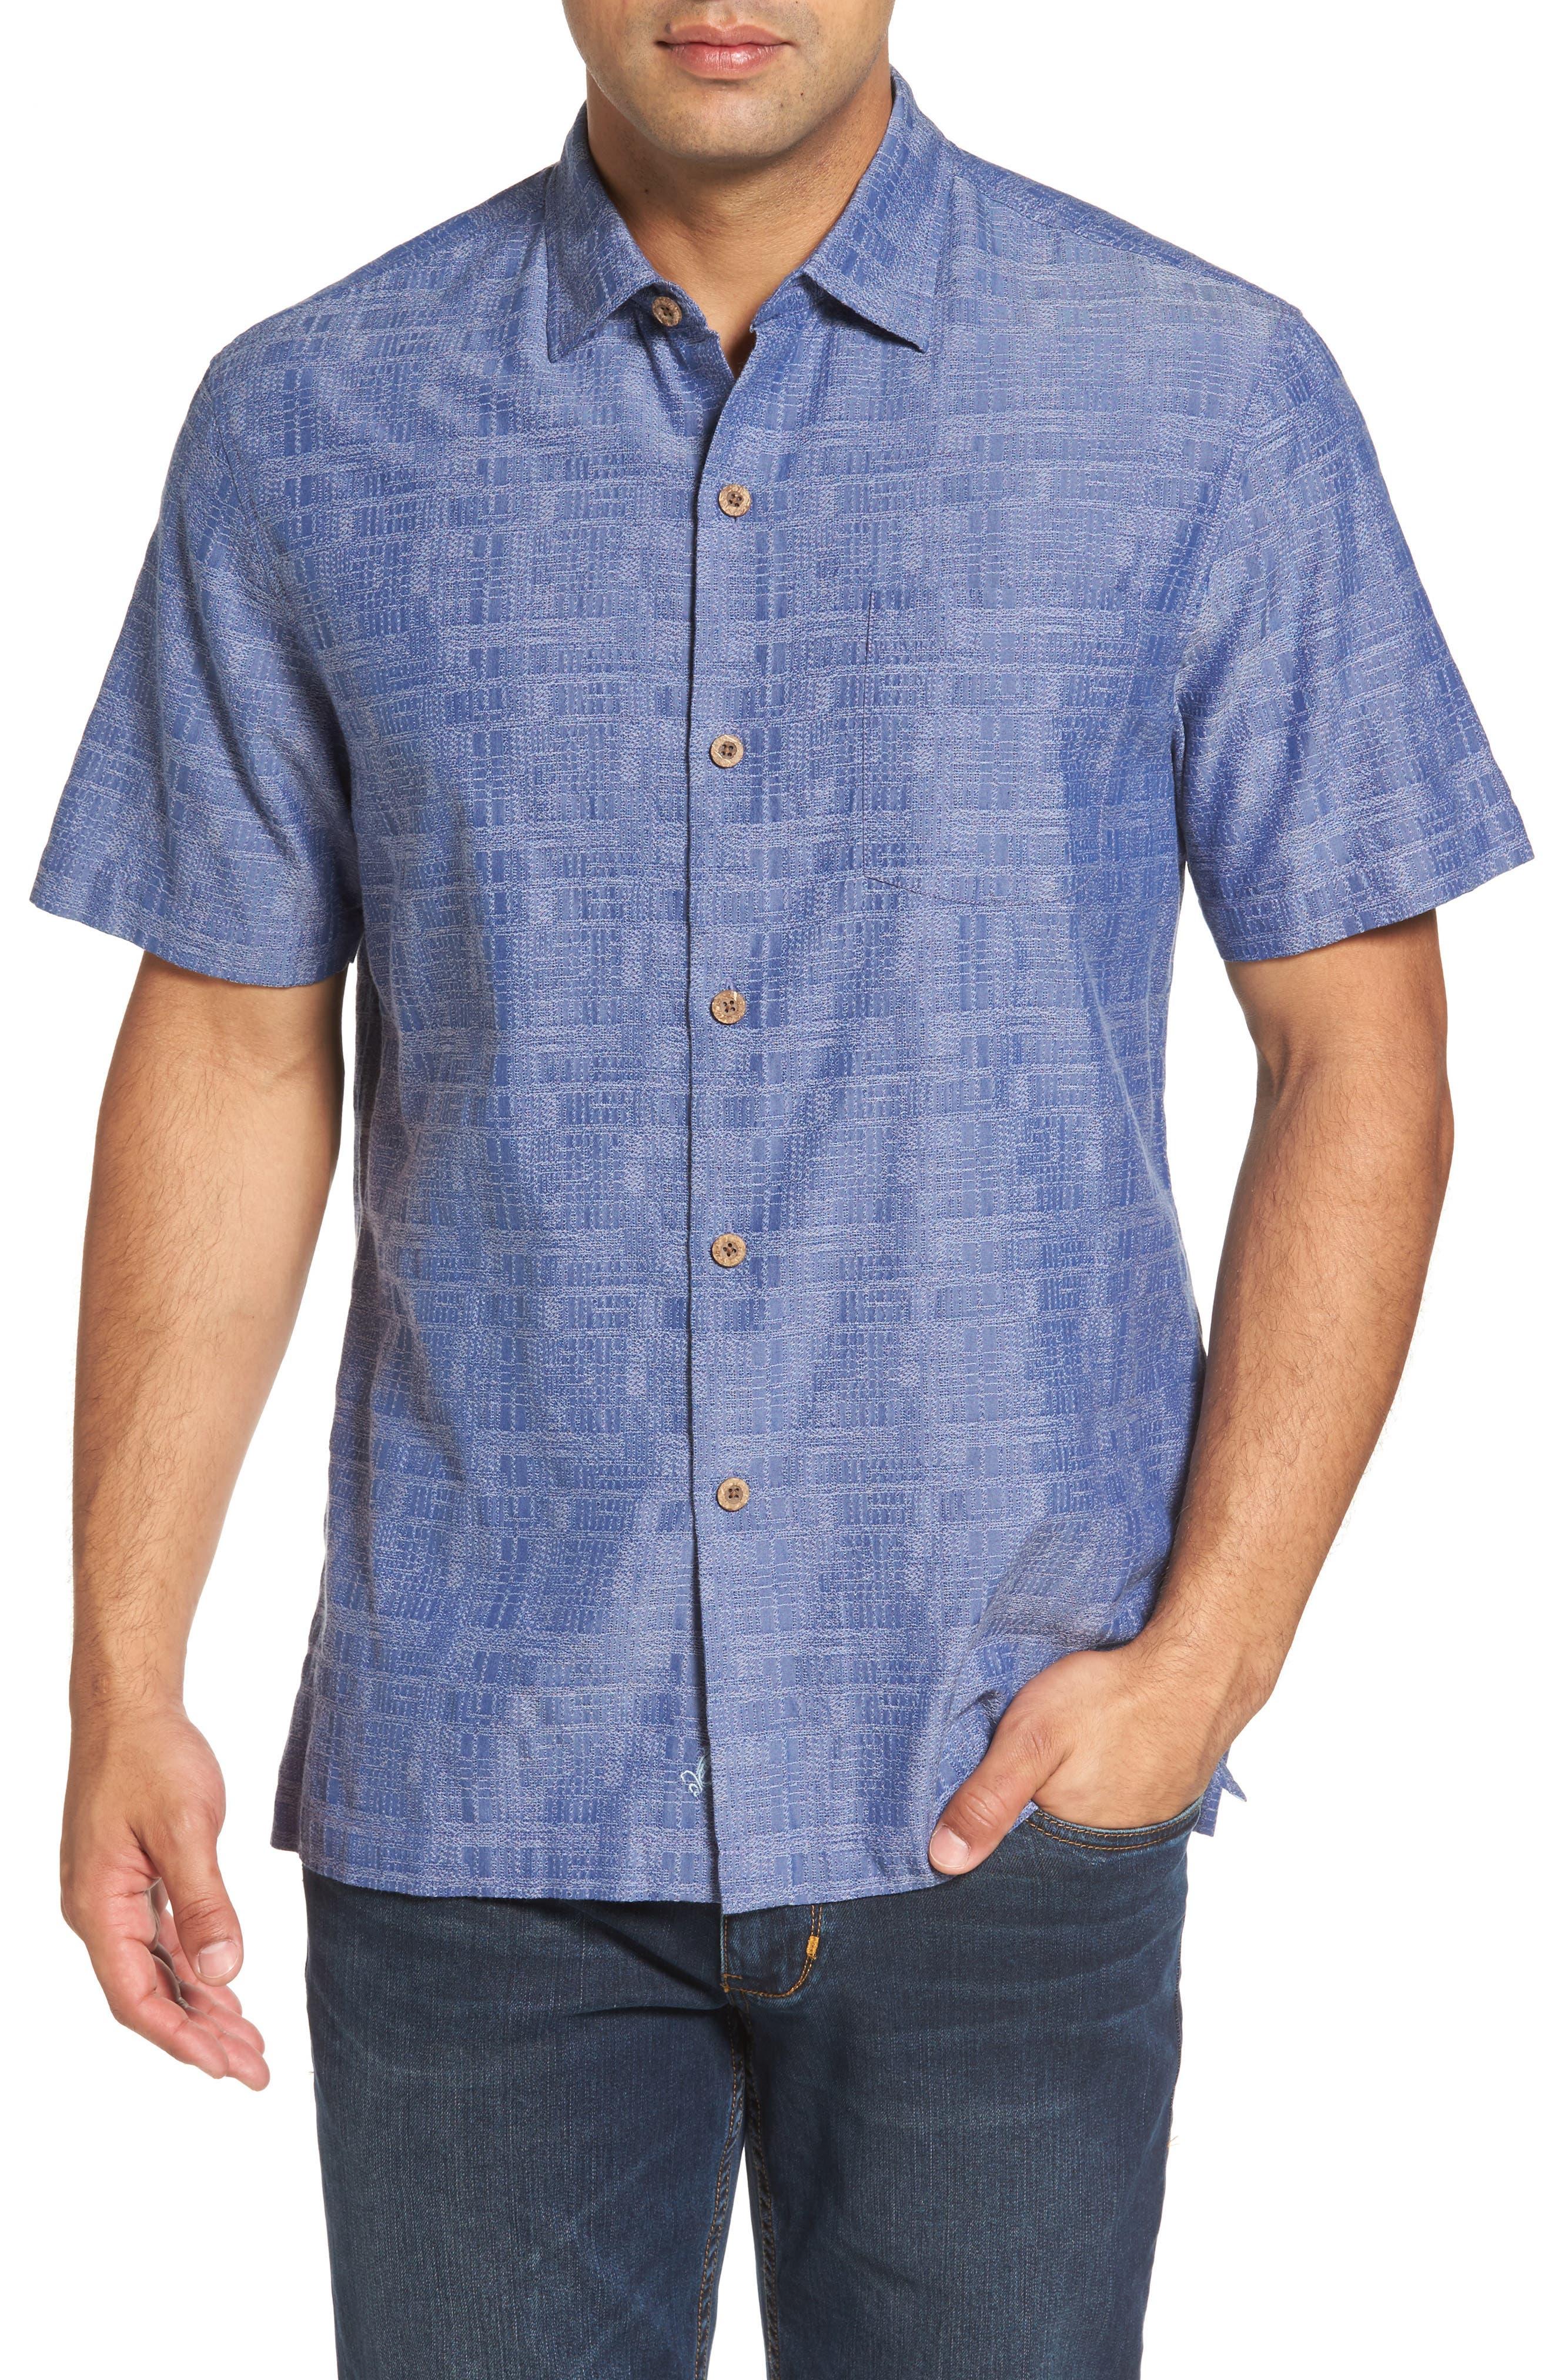 Oceanside Woven Shirt,                             Main thumbnail 1, color,                             Sanibel Blue